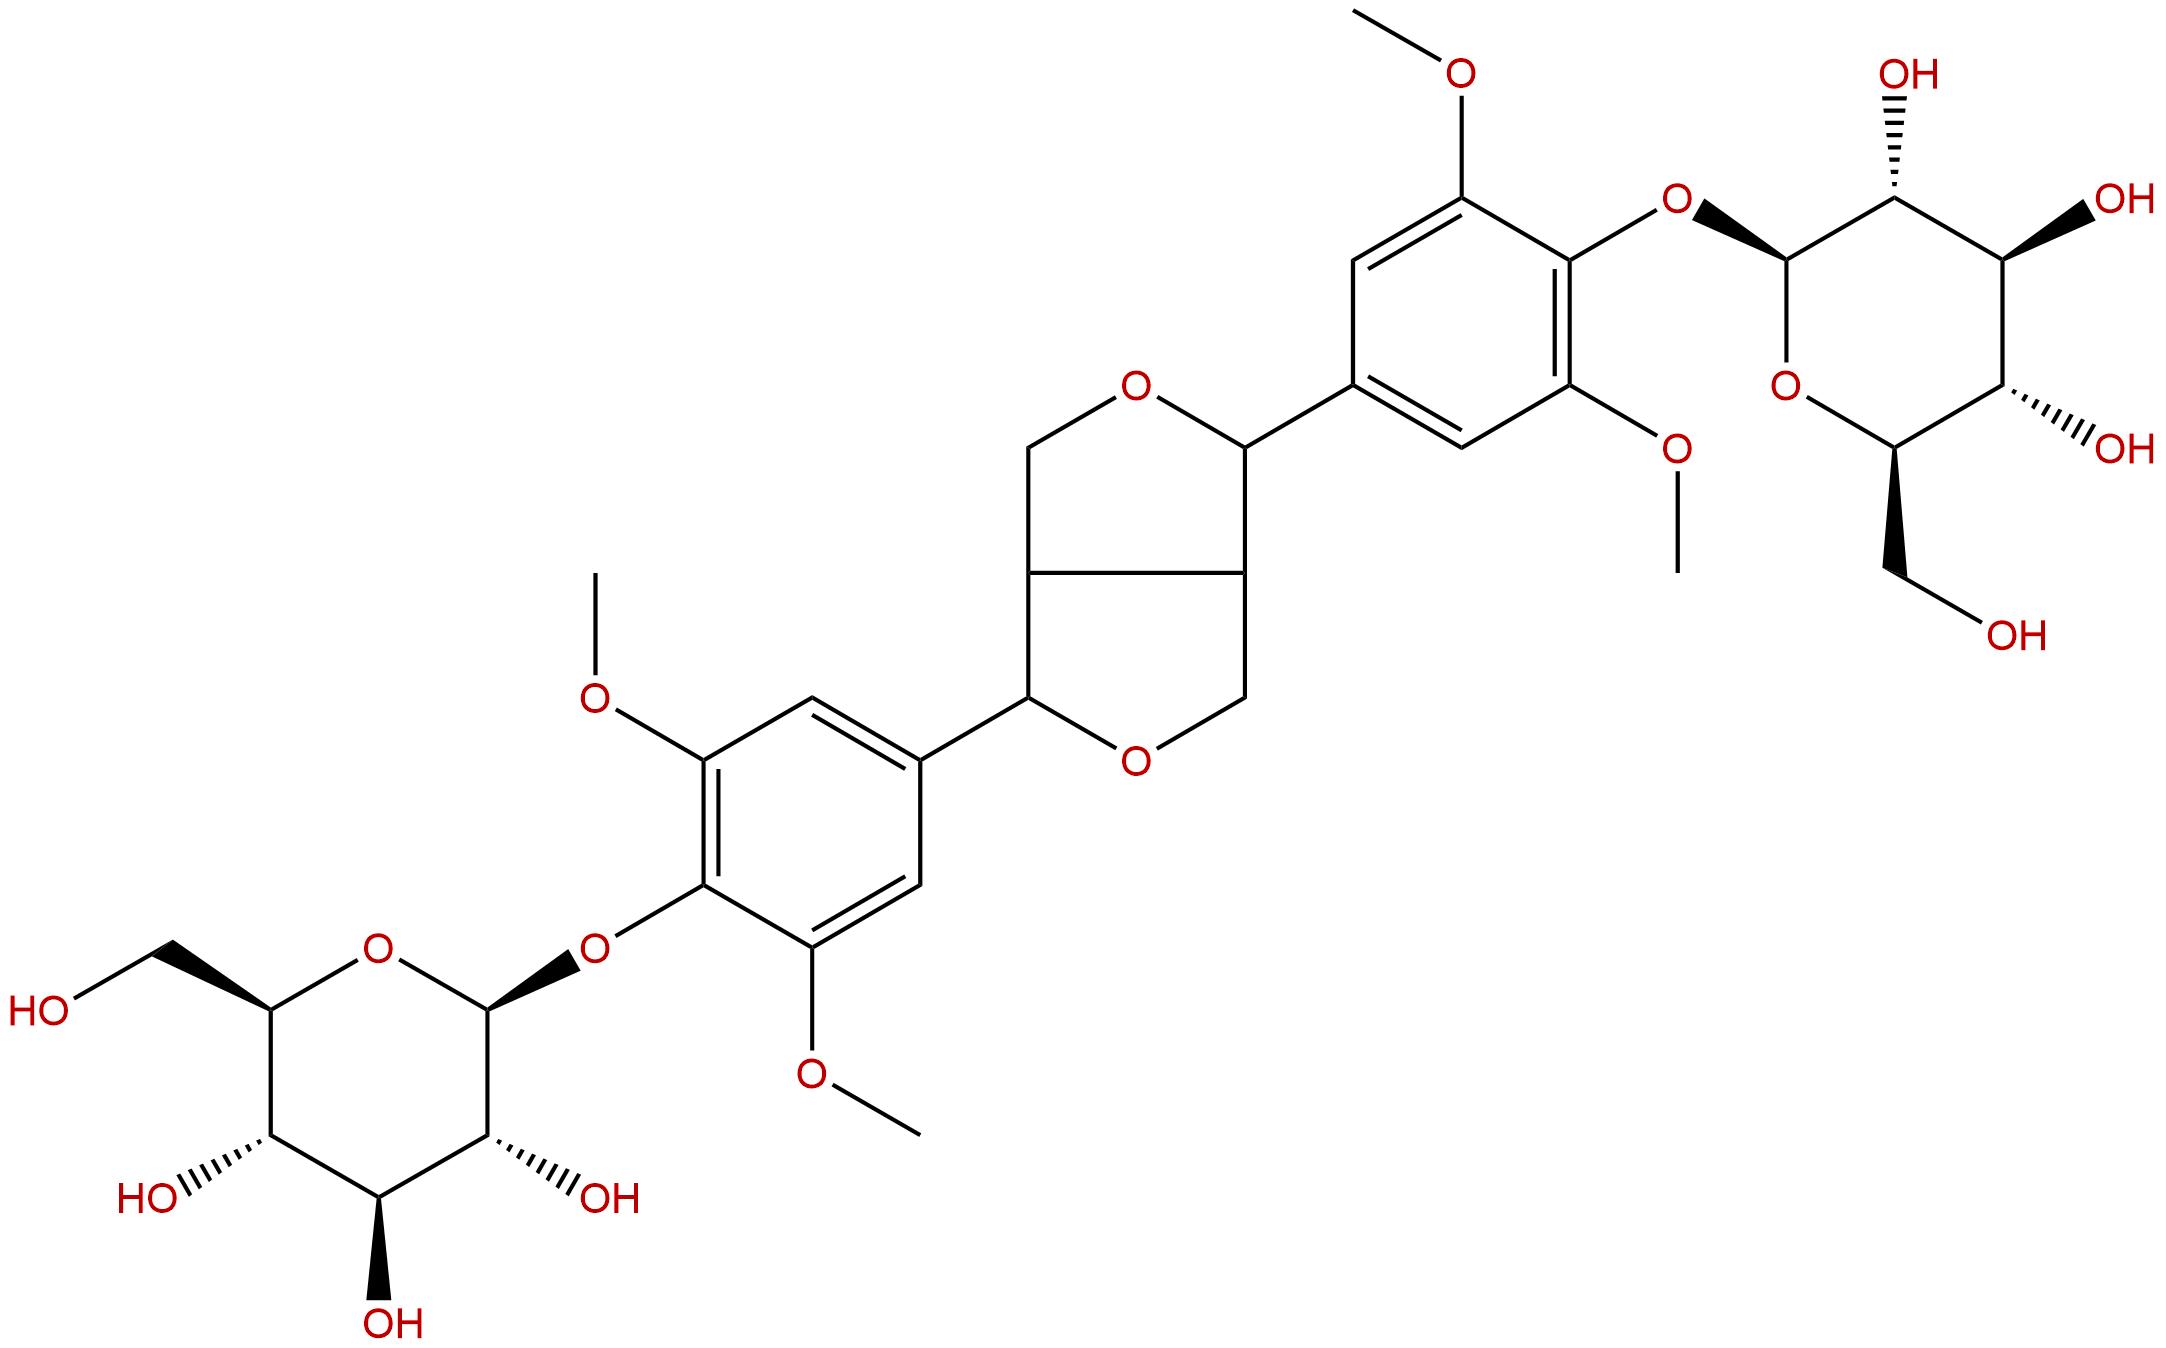 (-)-Syringaresinol di-O-glucoside